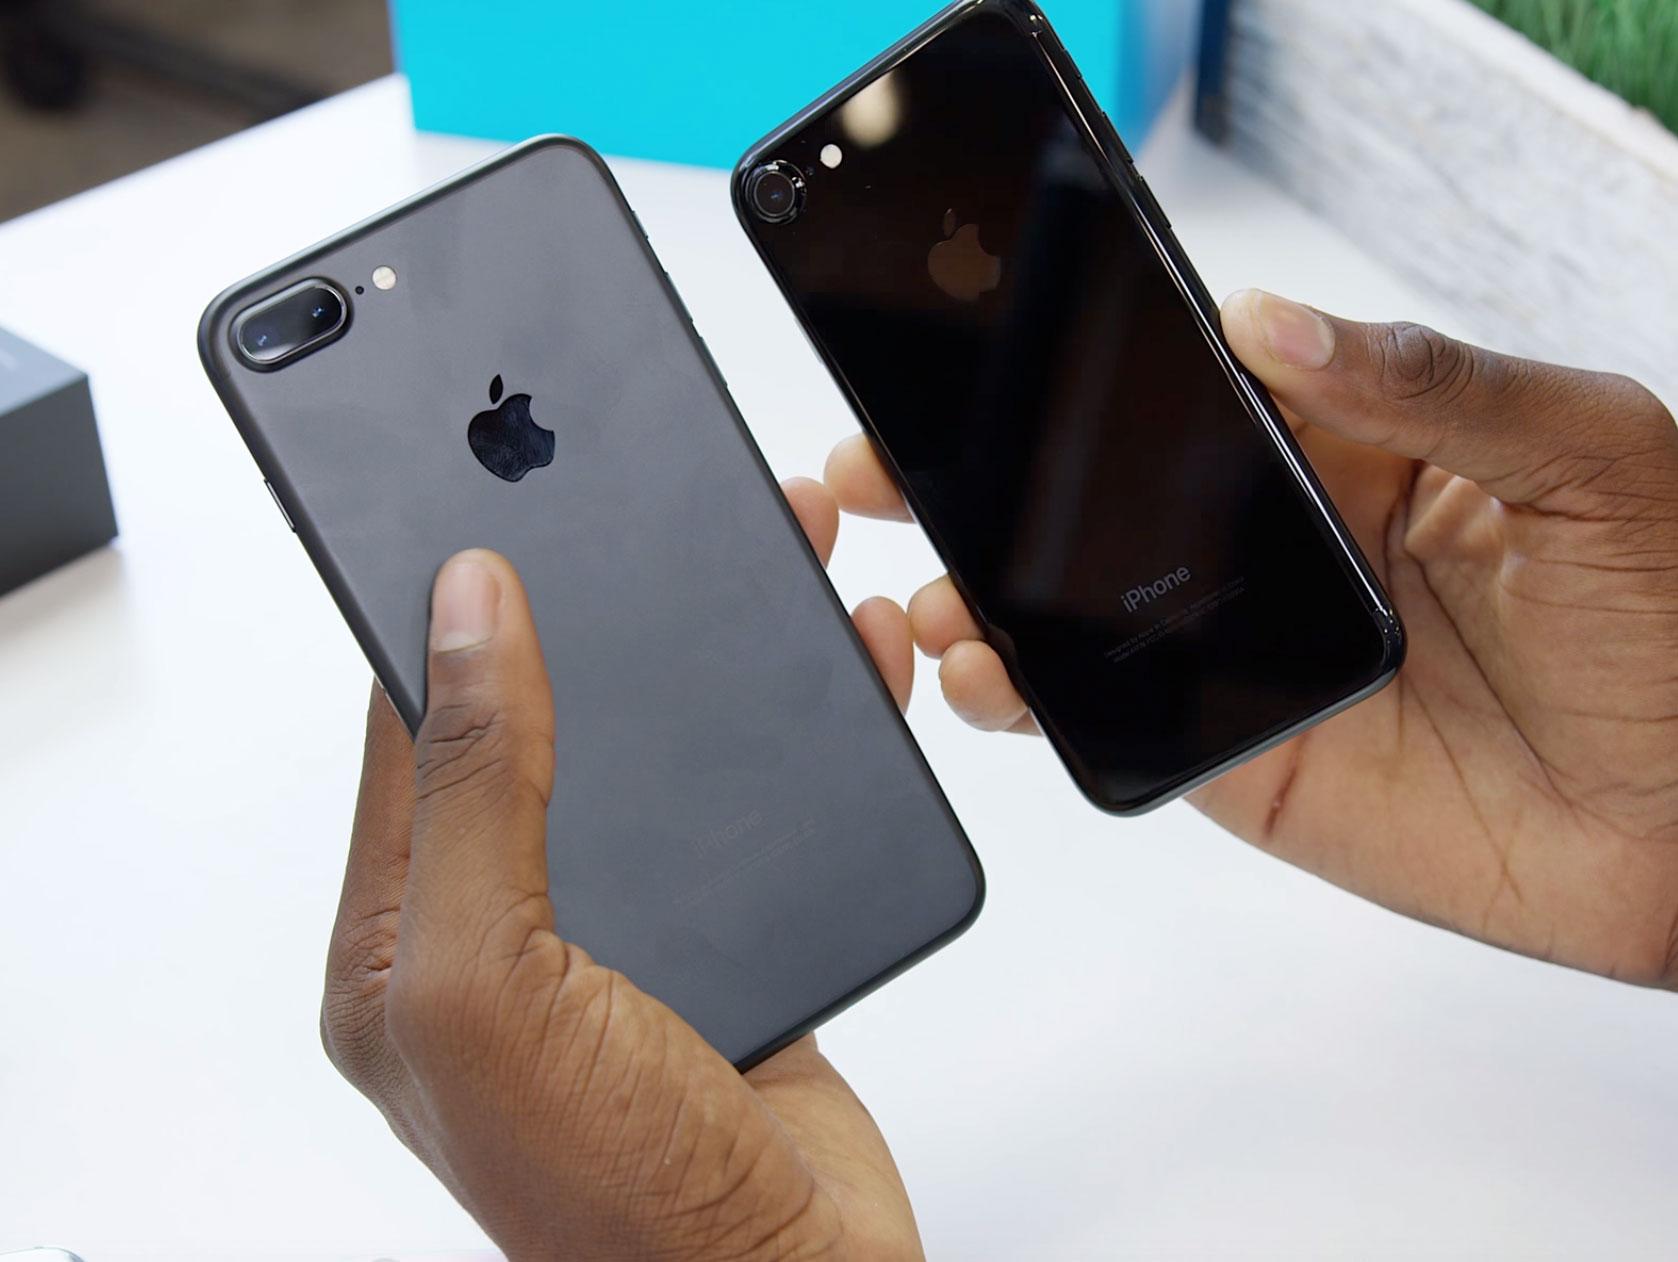 iPhone 7 Plus negro y iPhone 7 Jet Black